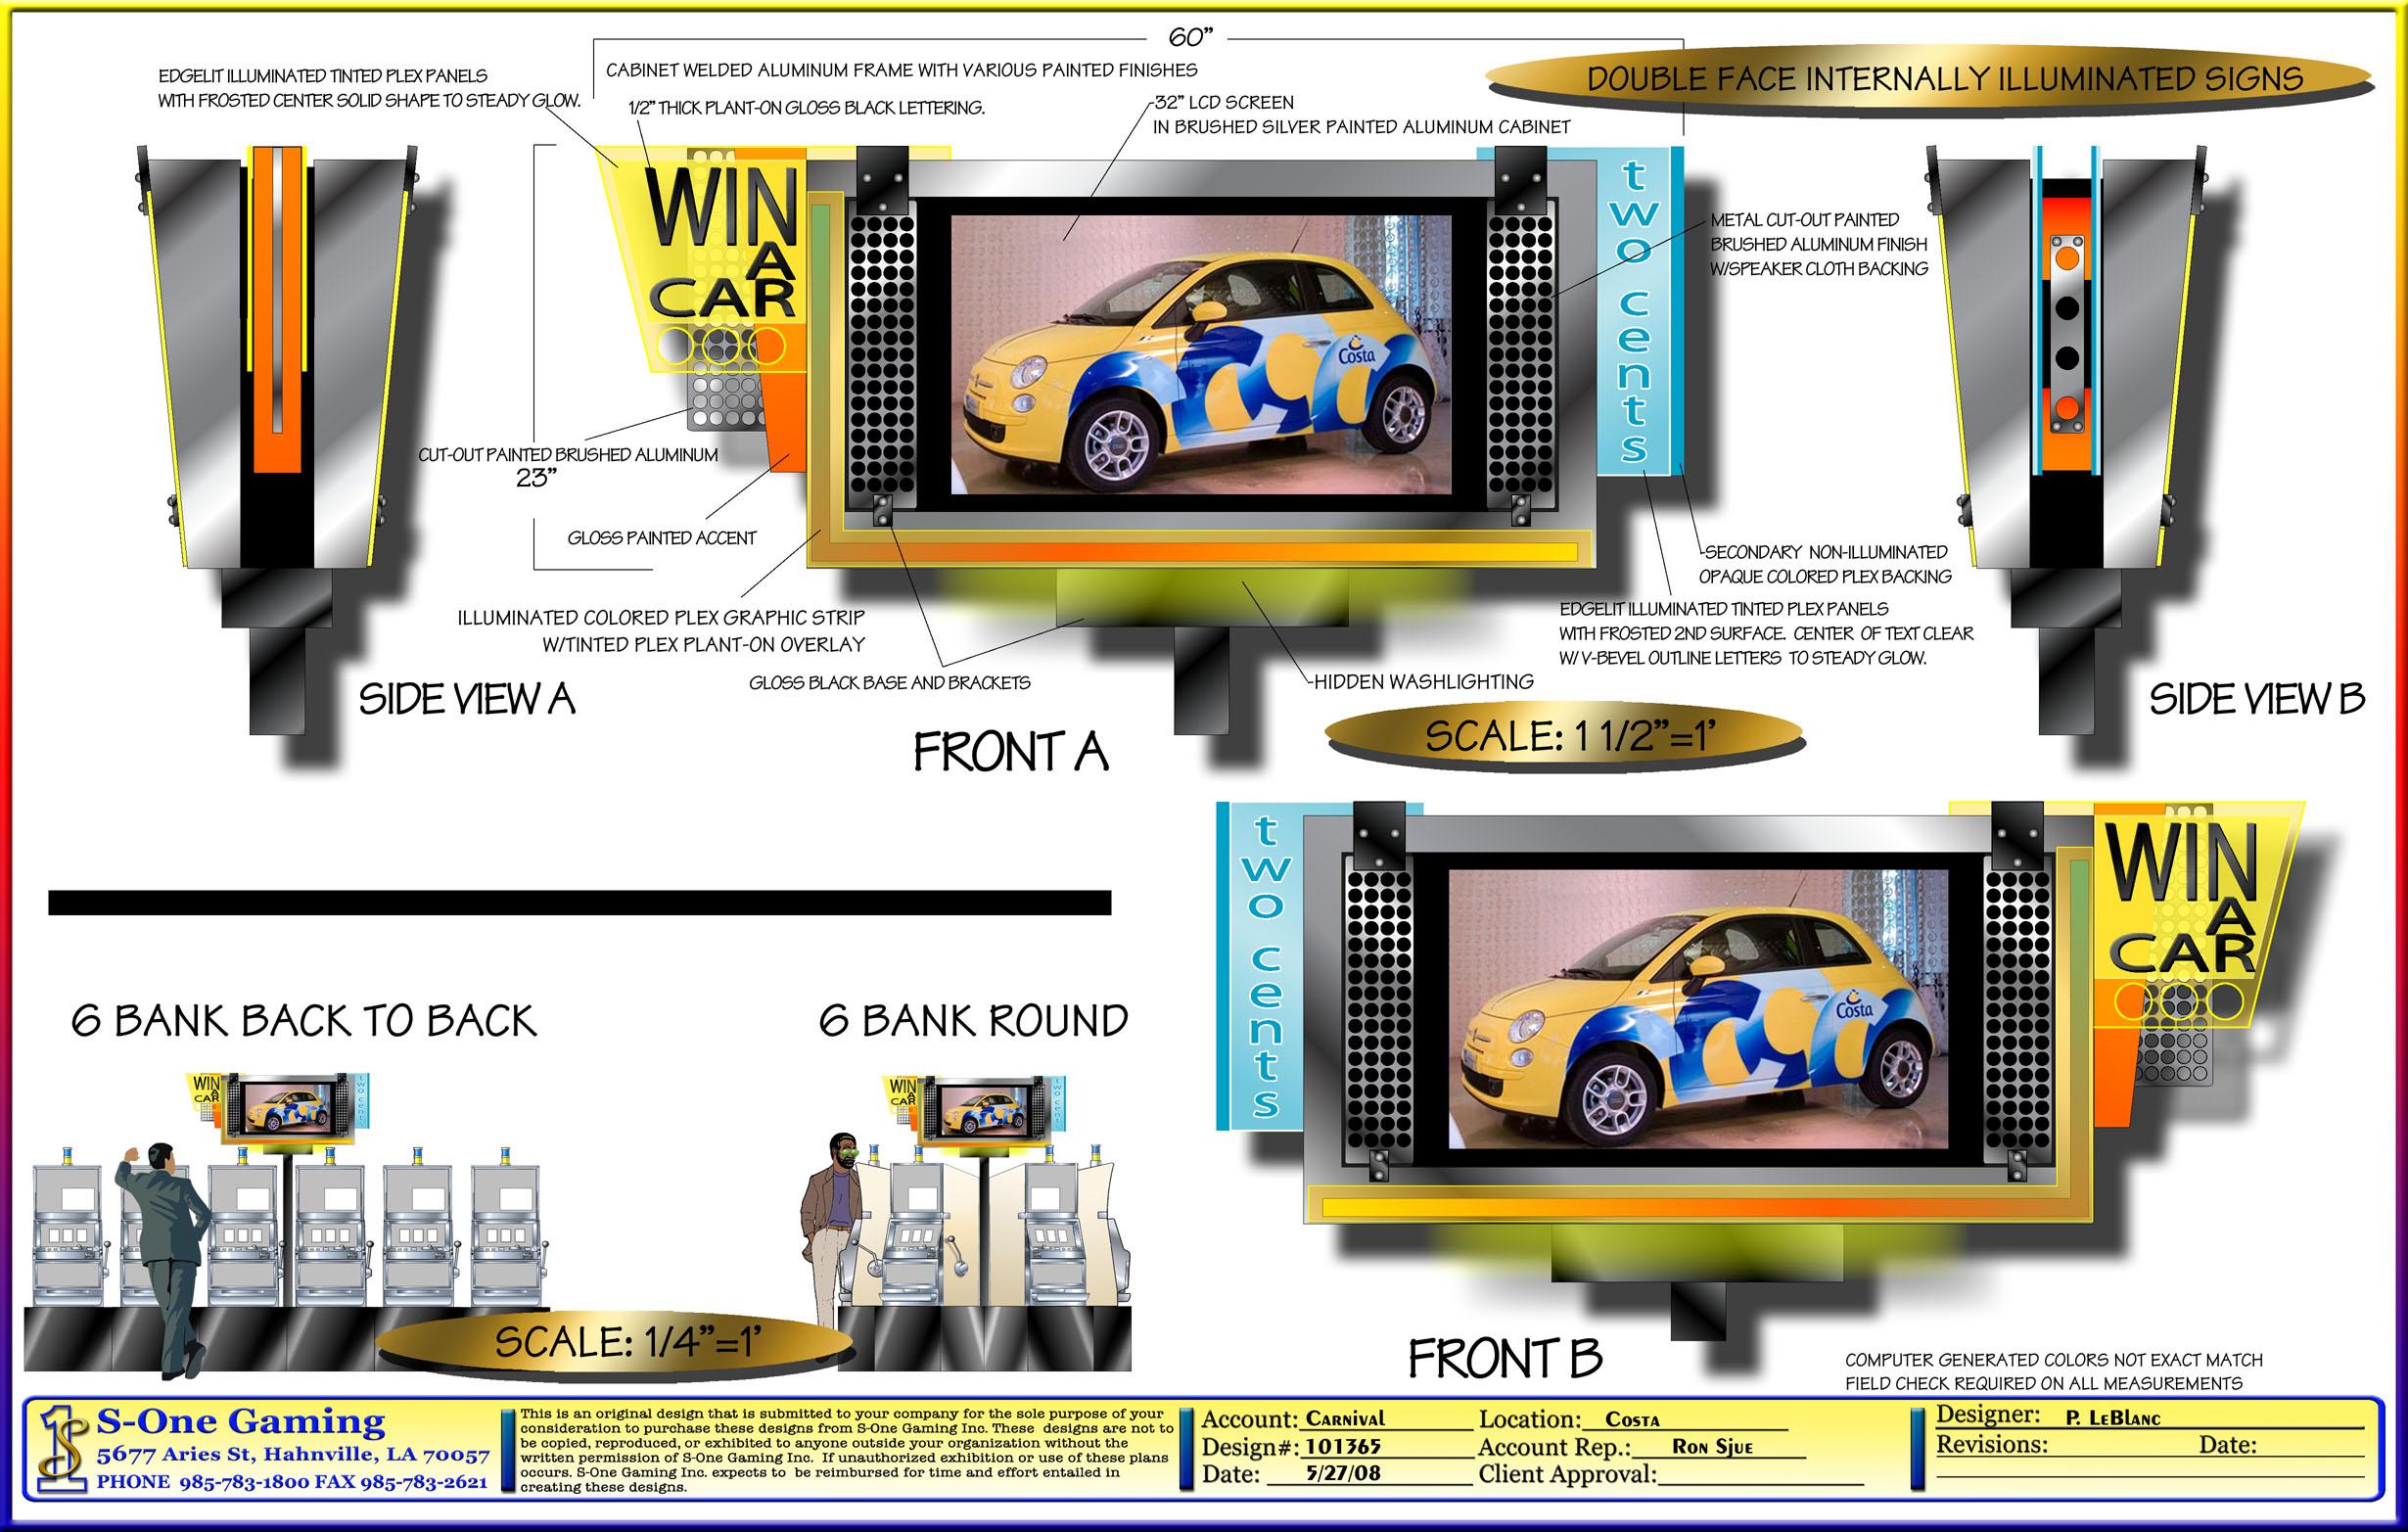 101365 carnival COSTA 2c winacar32inLCD.jpg